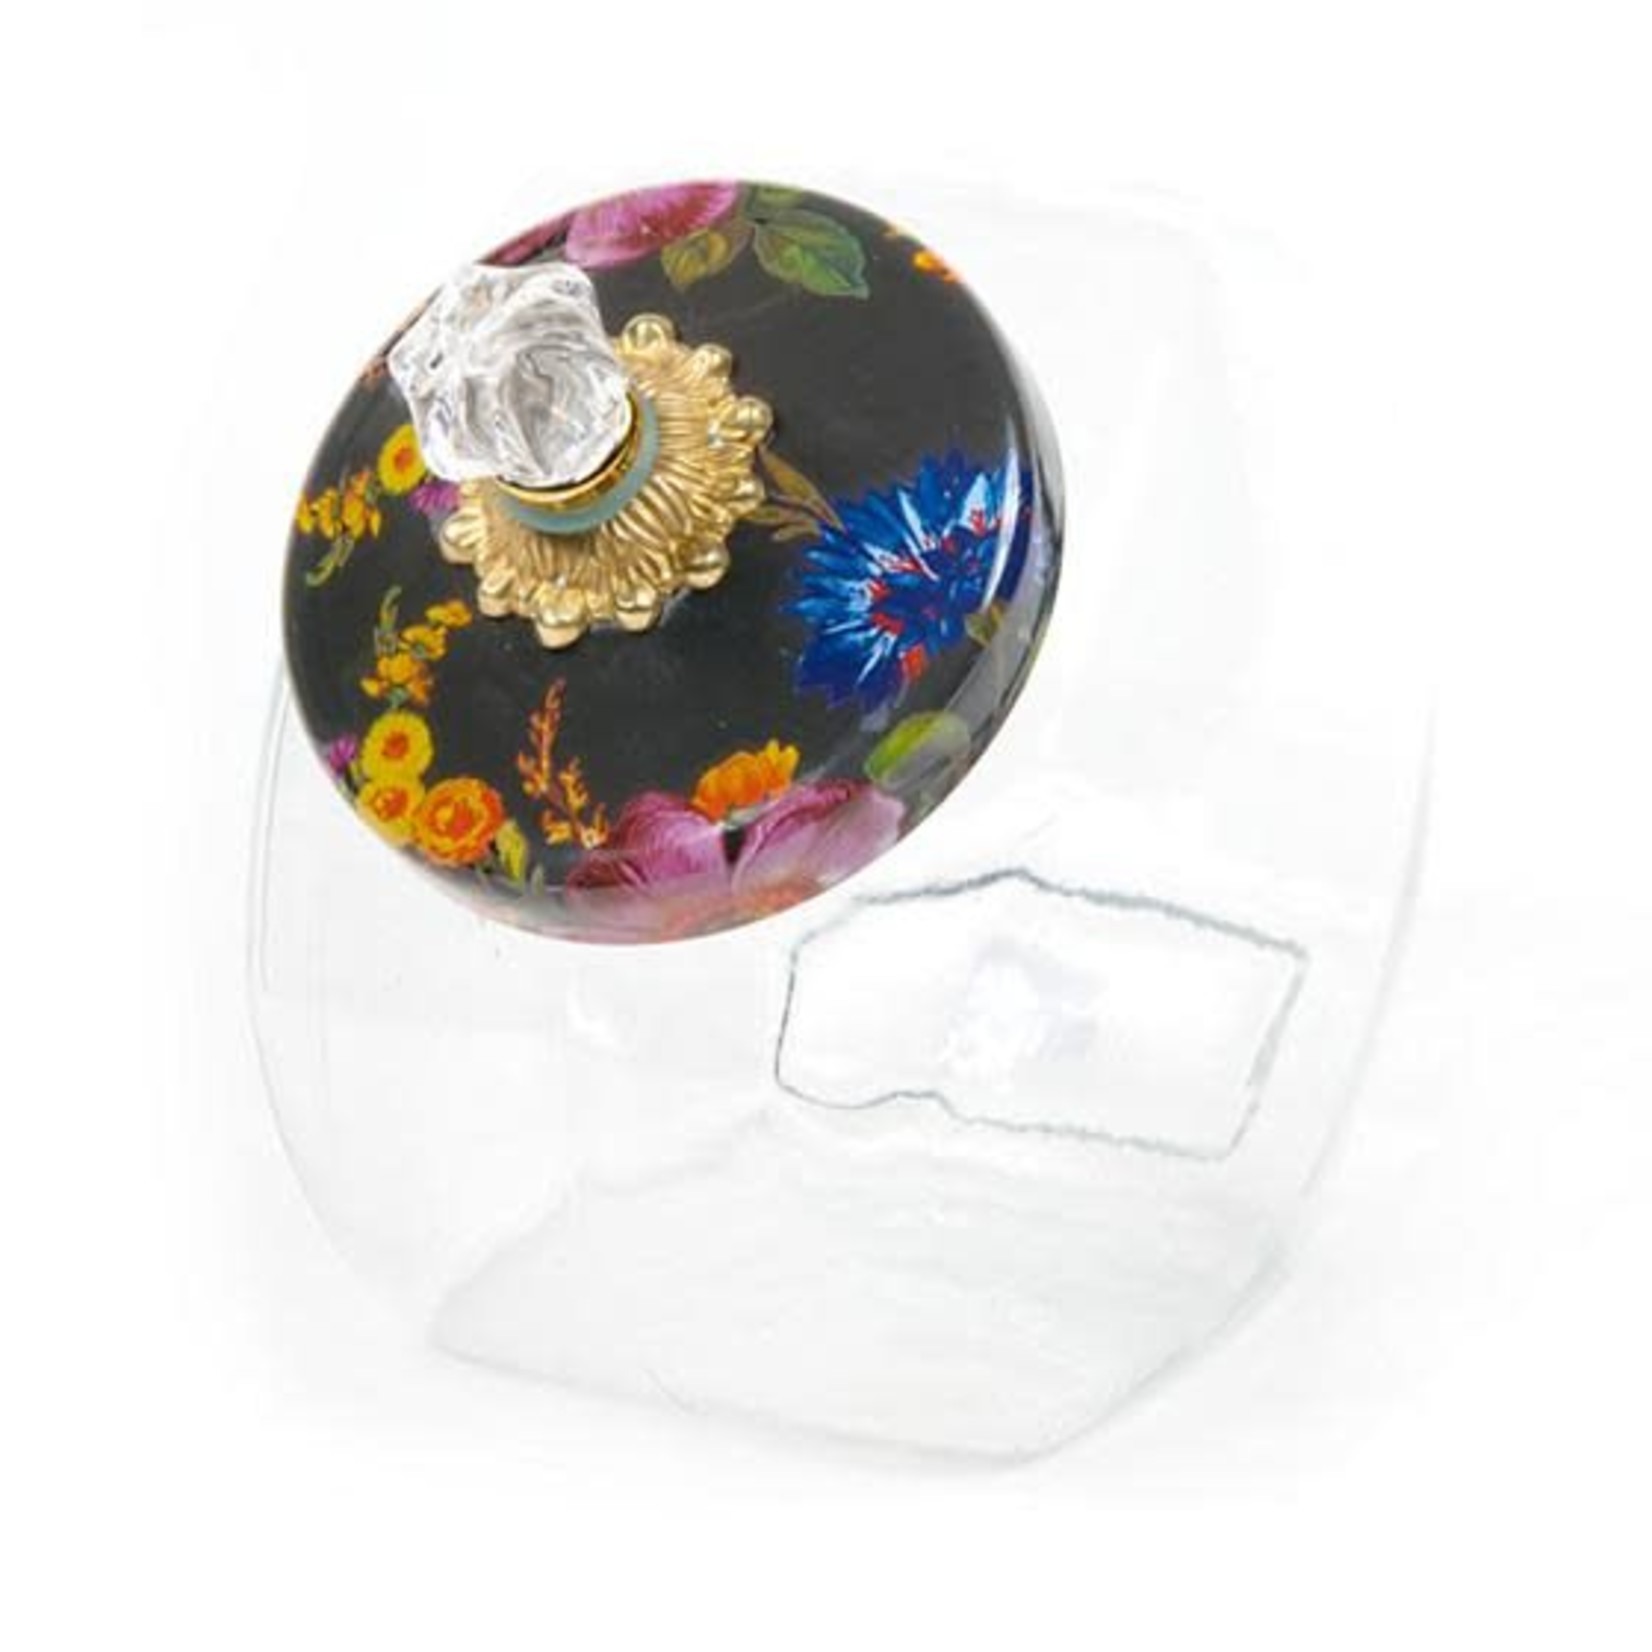 MacKenzie Childs Cookie Jar with Flower Market Enamel Lid - Black